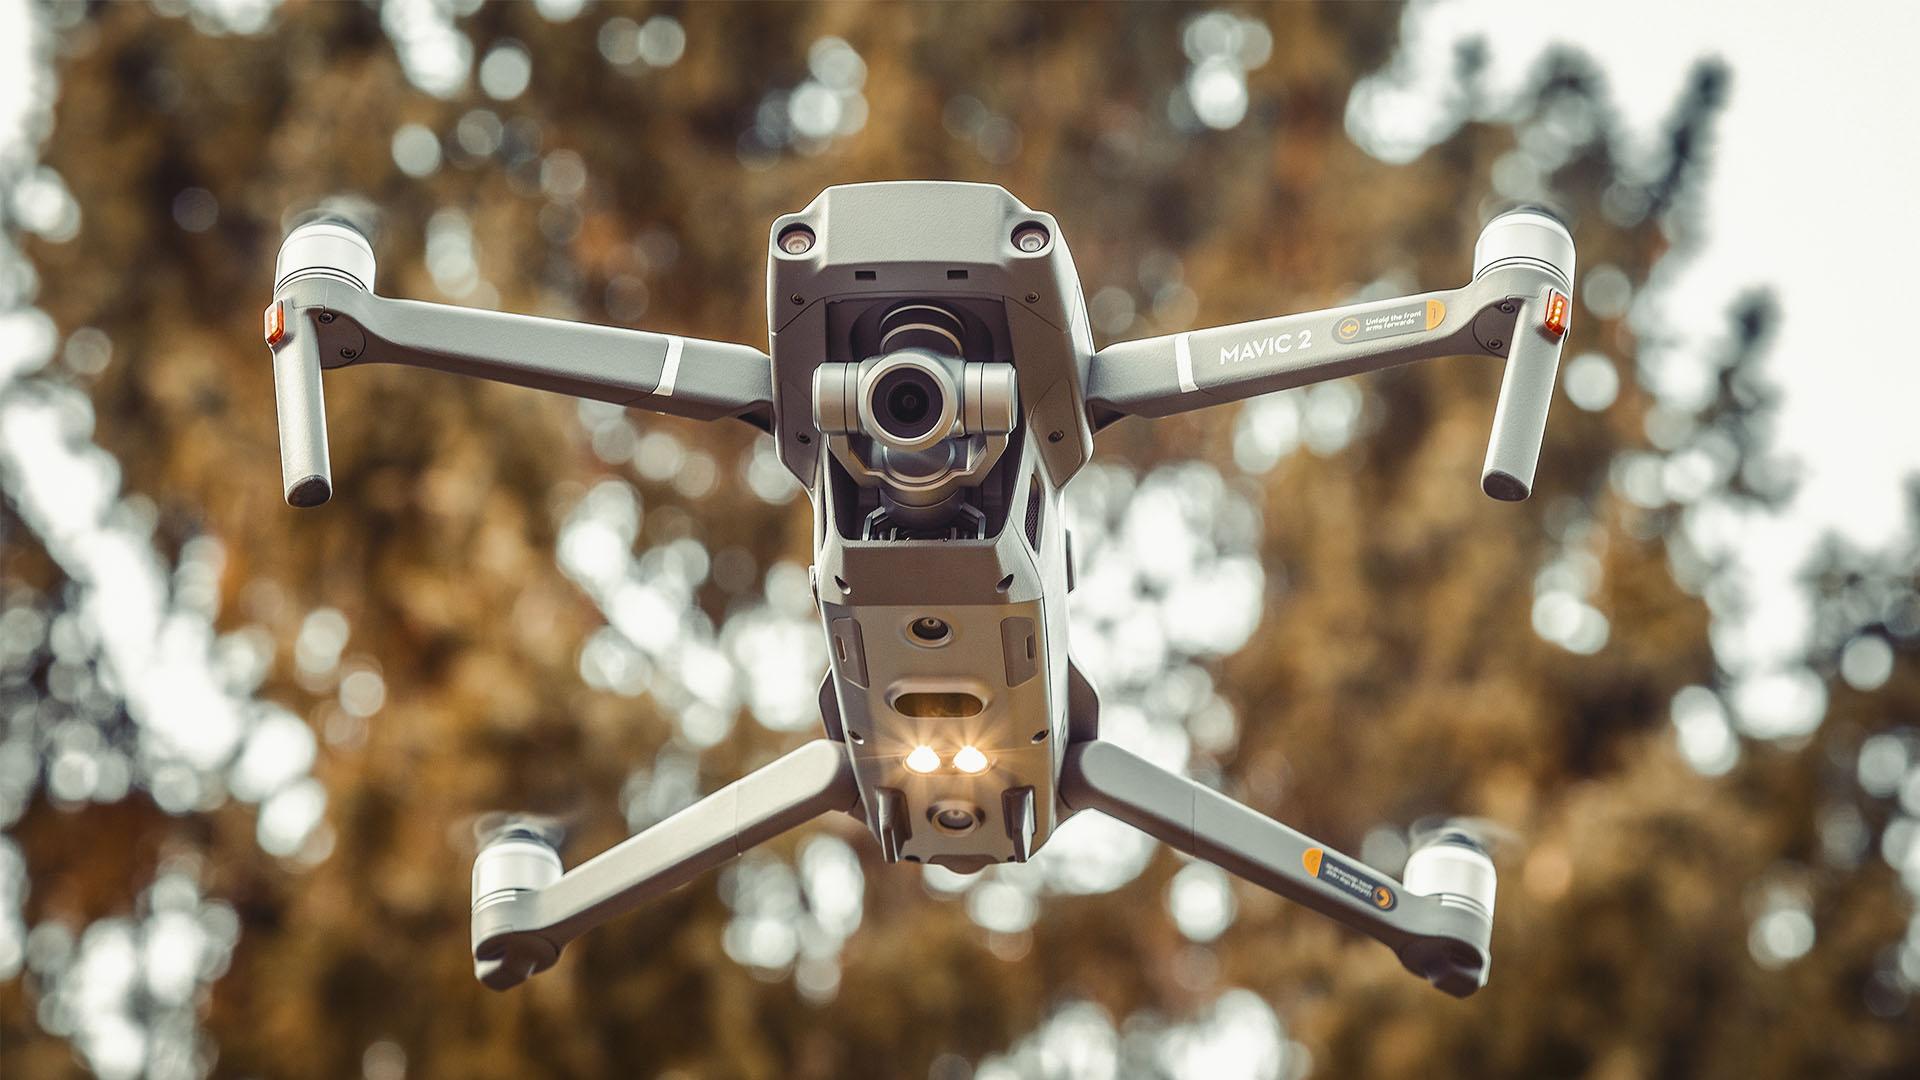 Intro to DRONES